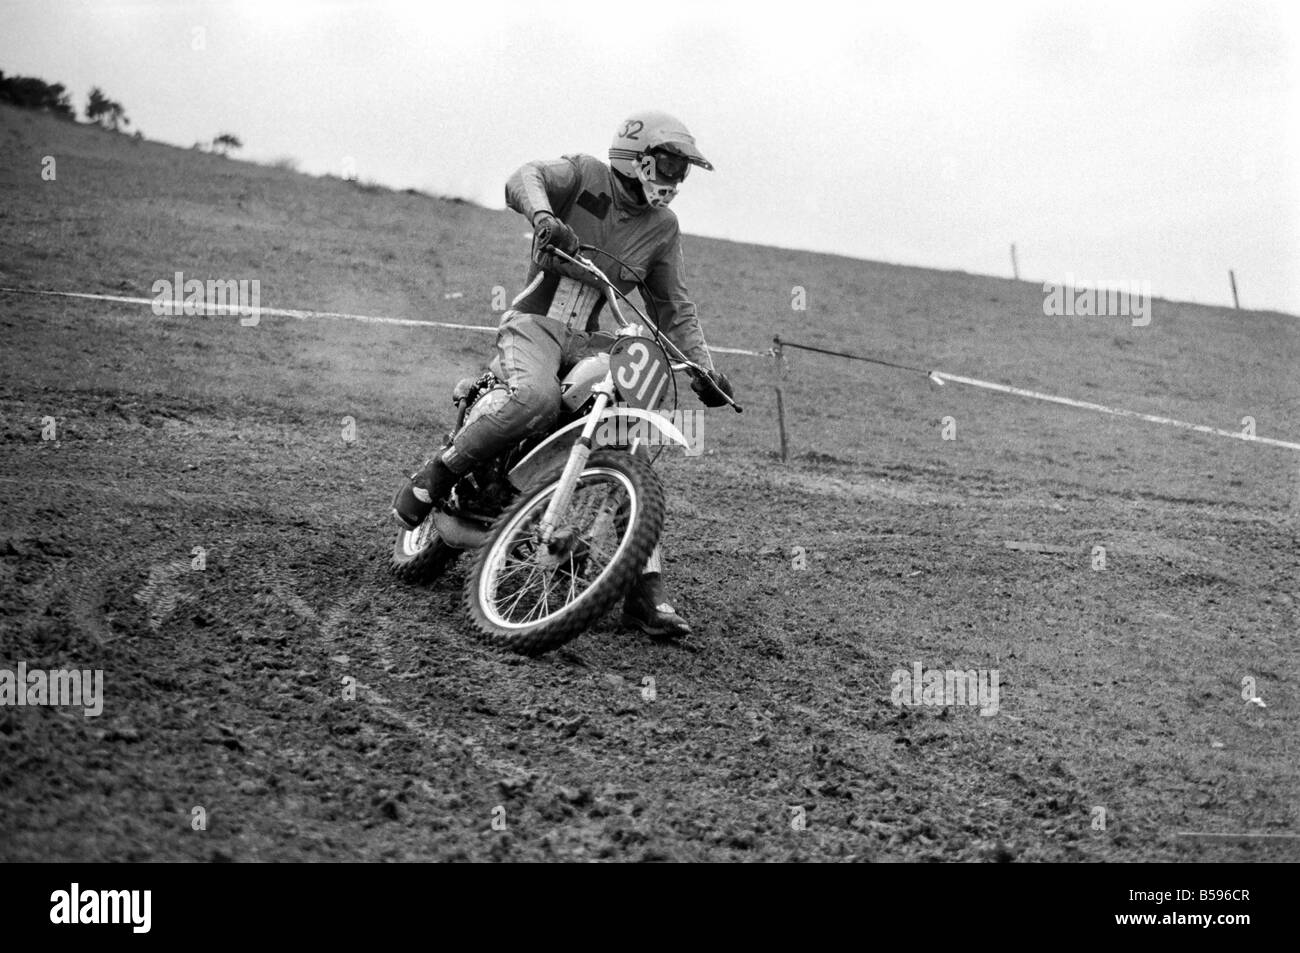 Motorsport/Children/Motorbike: Schoolboys Scramble. March 1975 75-01212-004 - Stock Image